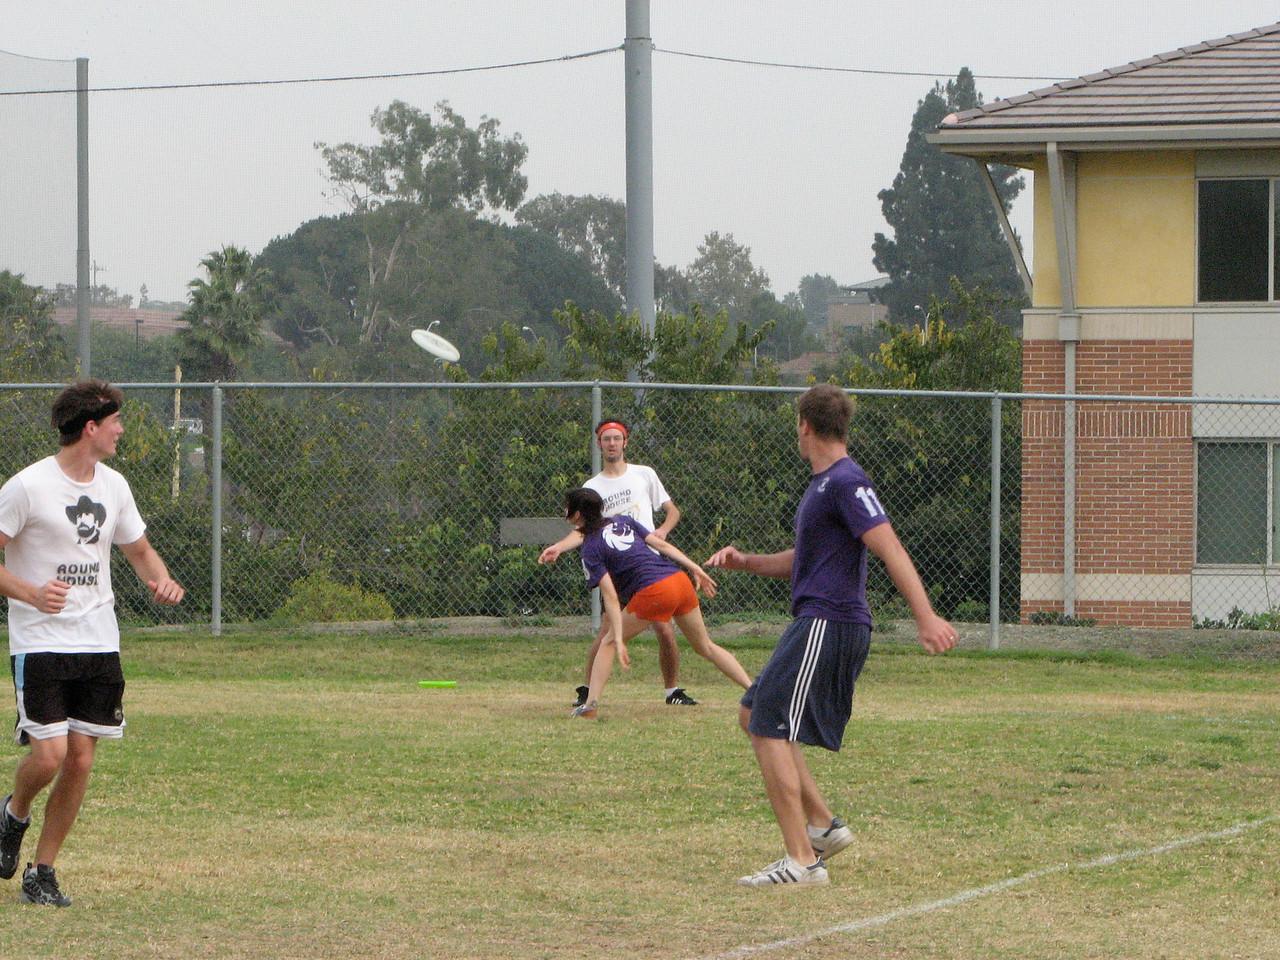 2006 11 03 Fri - Becca defending